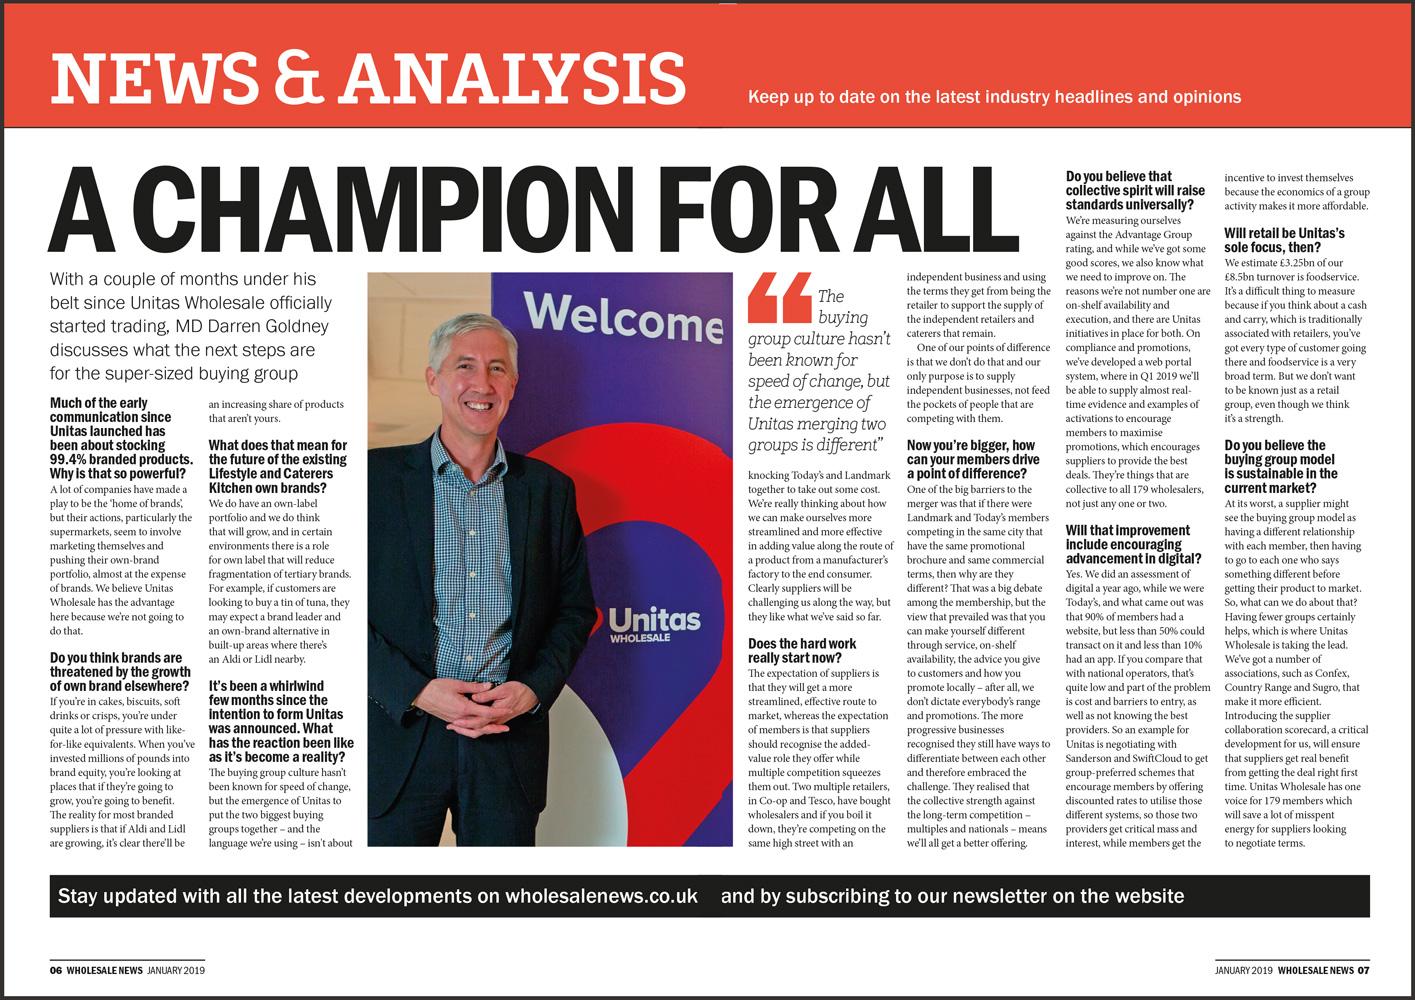 Unitas Managing Director Darren Goldney speaks to Wholesale News